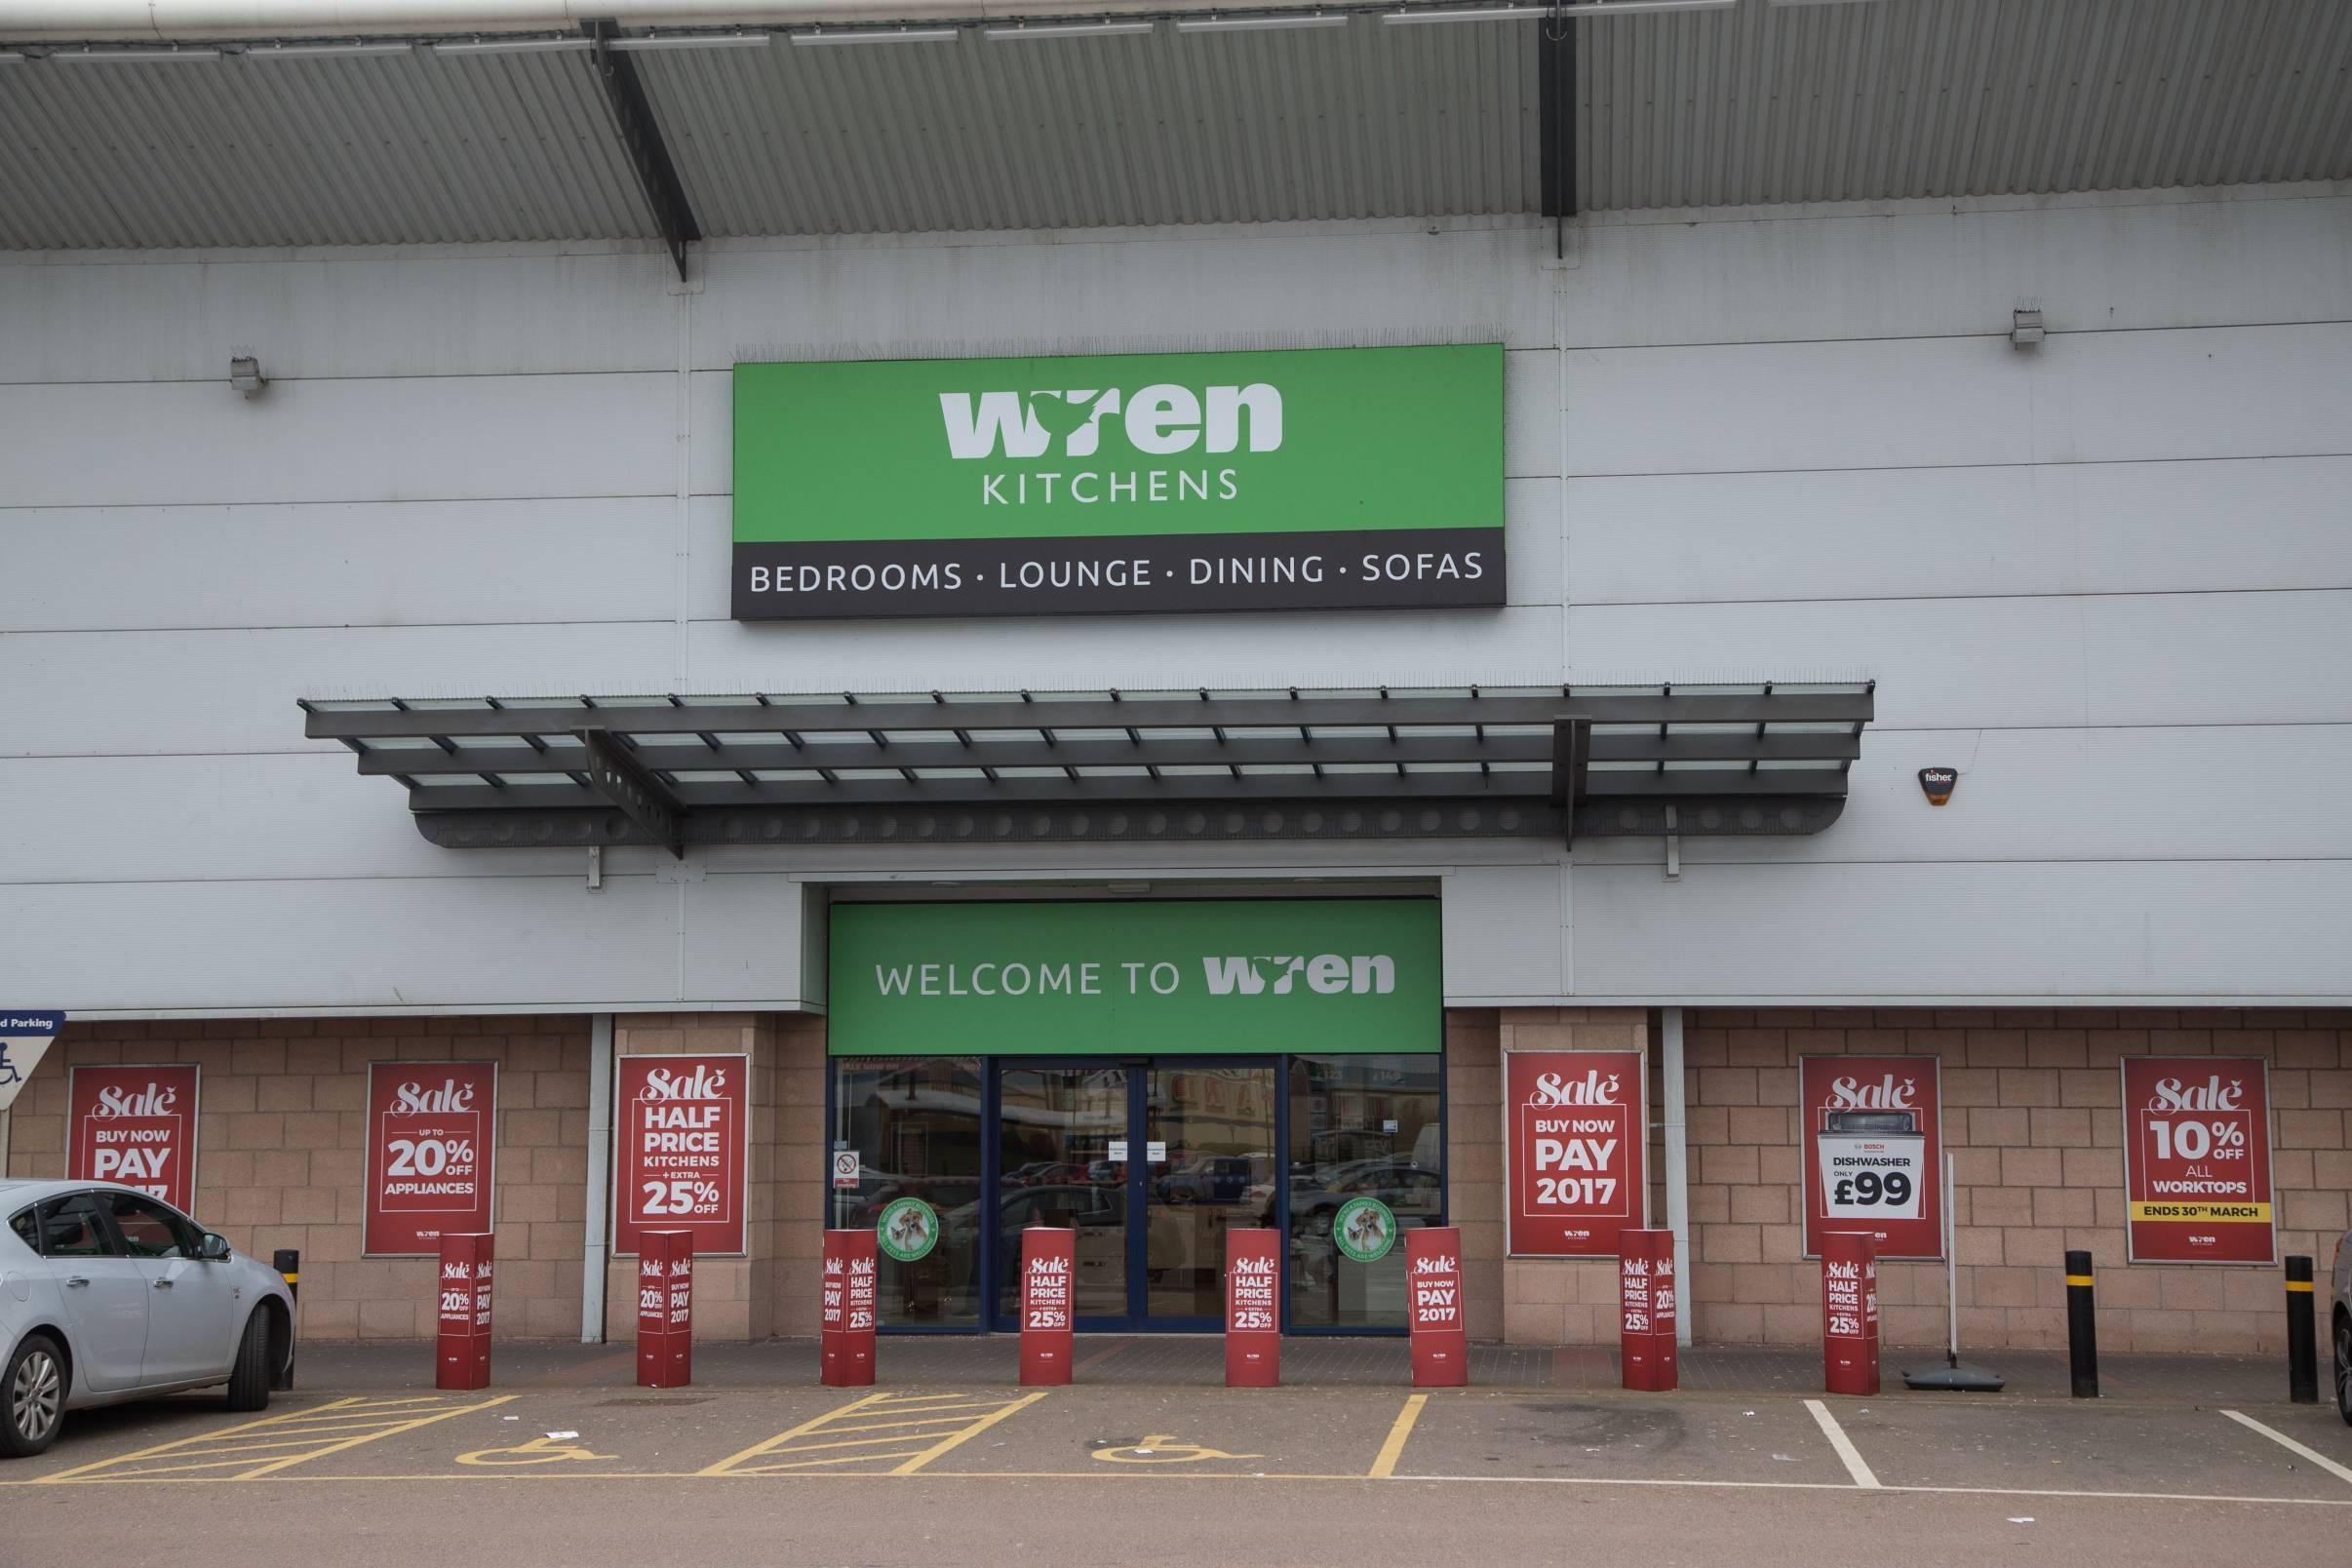 Wren Kitchens at Aberdeen's Beach Boulevard retail park.